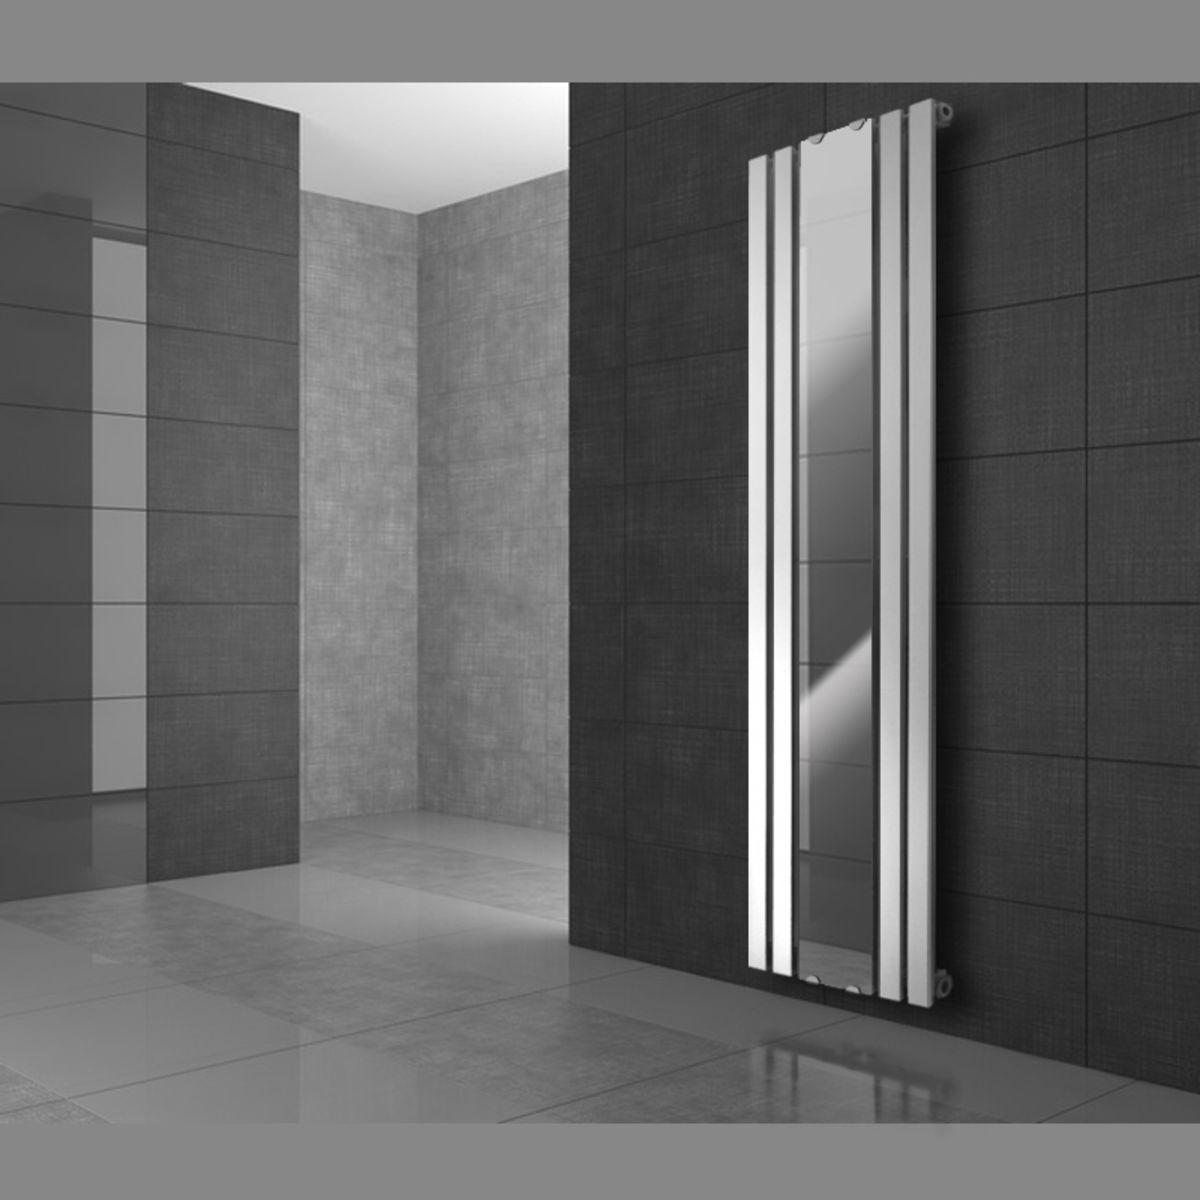 600x1800mm designheizk rper mit spiegel paneelheizk rper radiator badheizk rper ebay. Black Bedroom Furniture Sets. Home Design Ideas